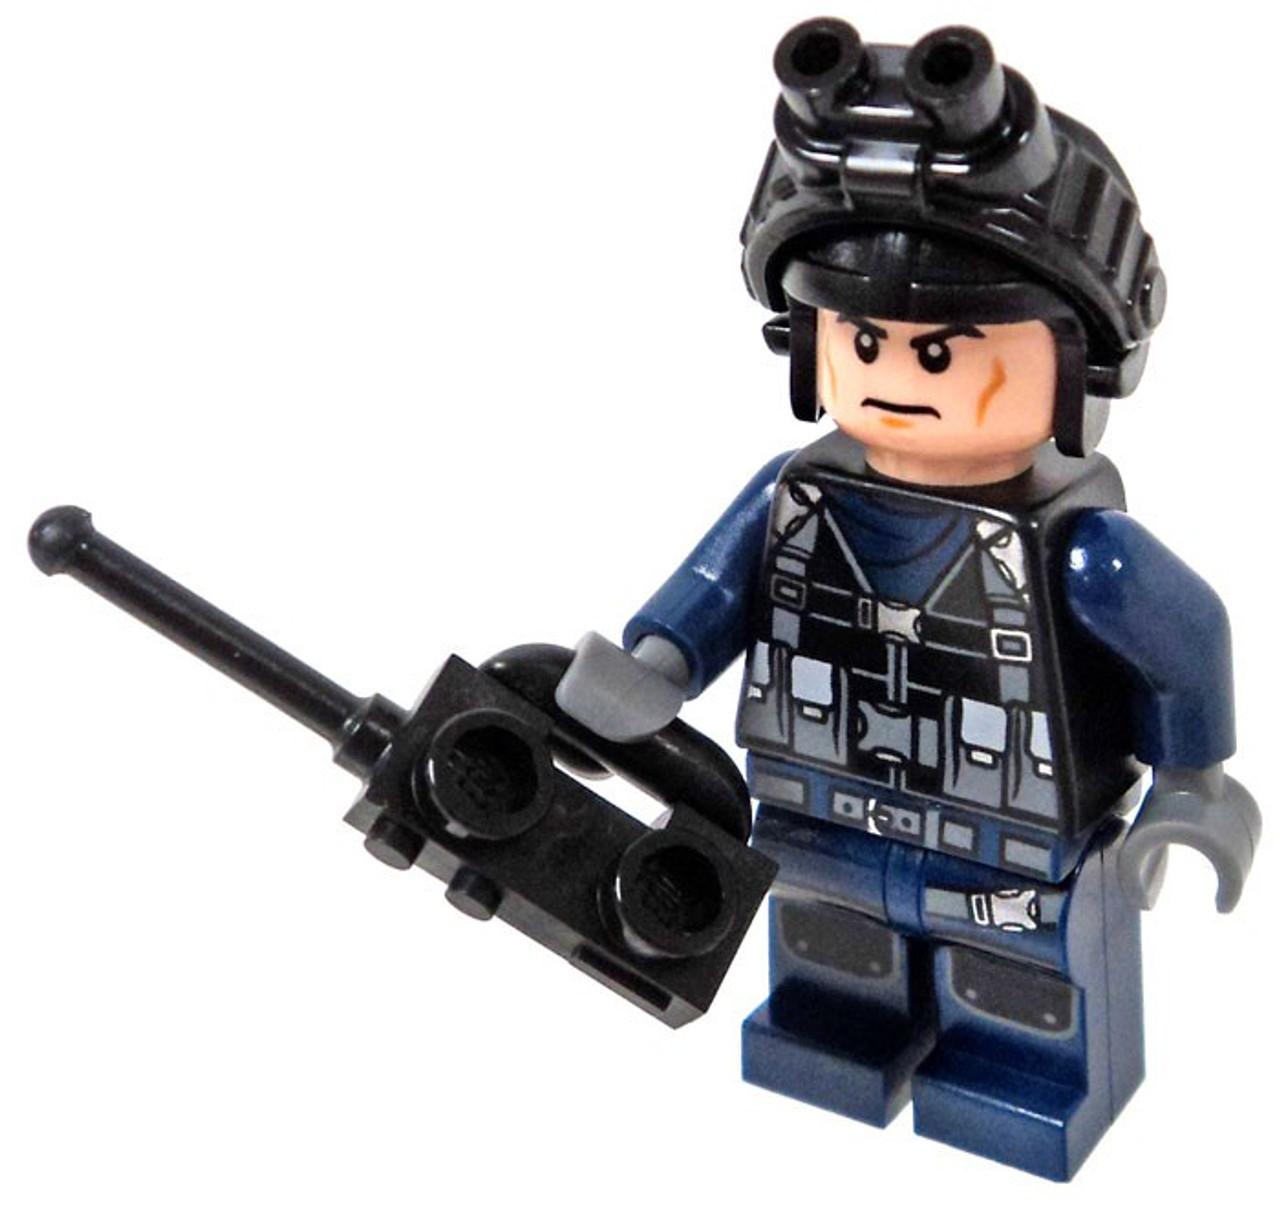 LEGO Jurassic World Fallen Kingdom Guard Minifigure with